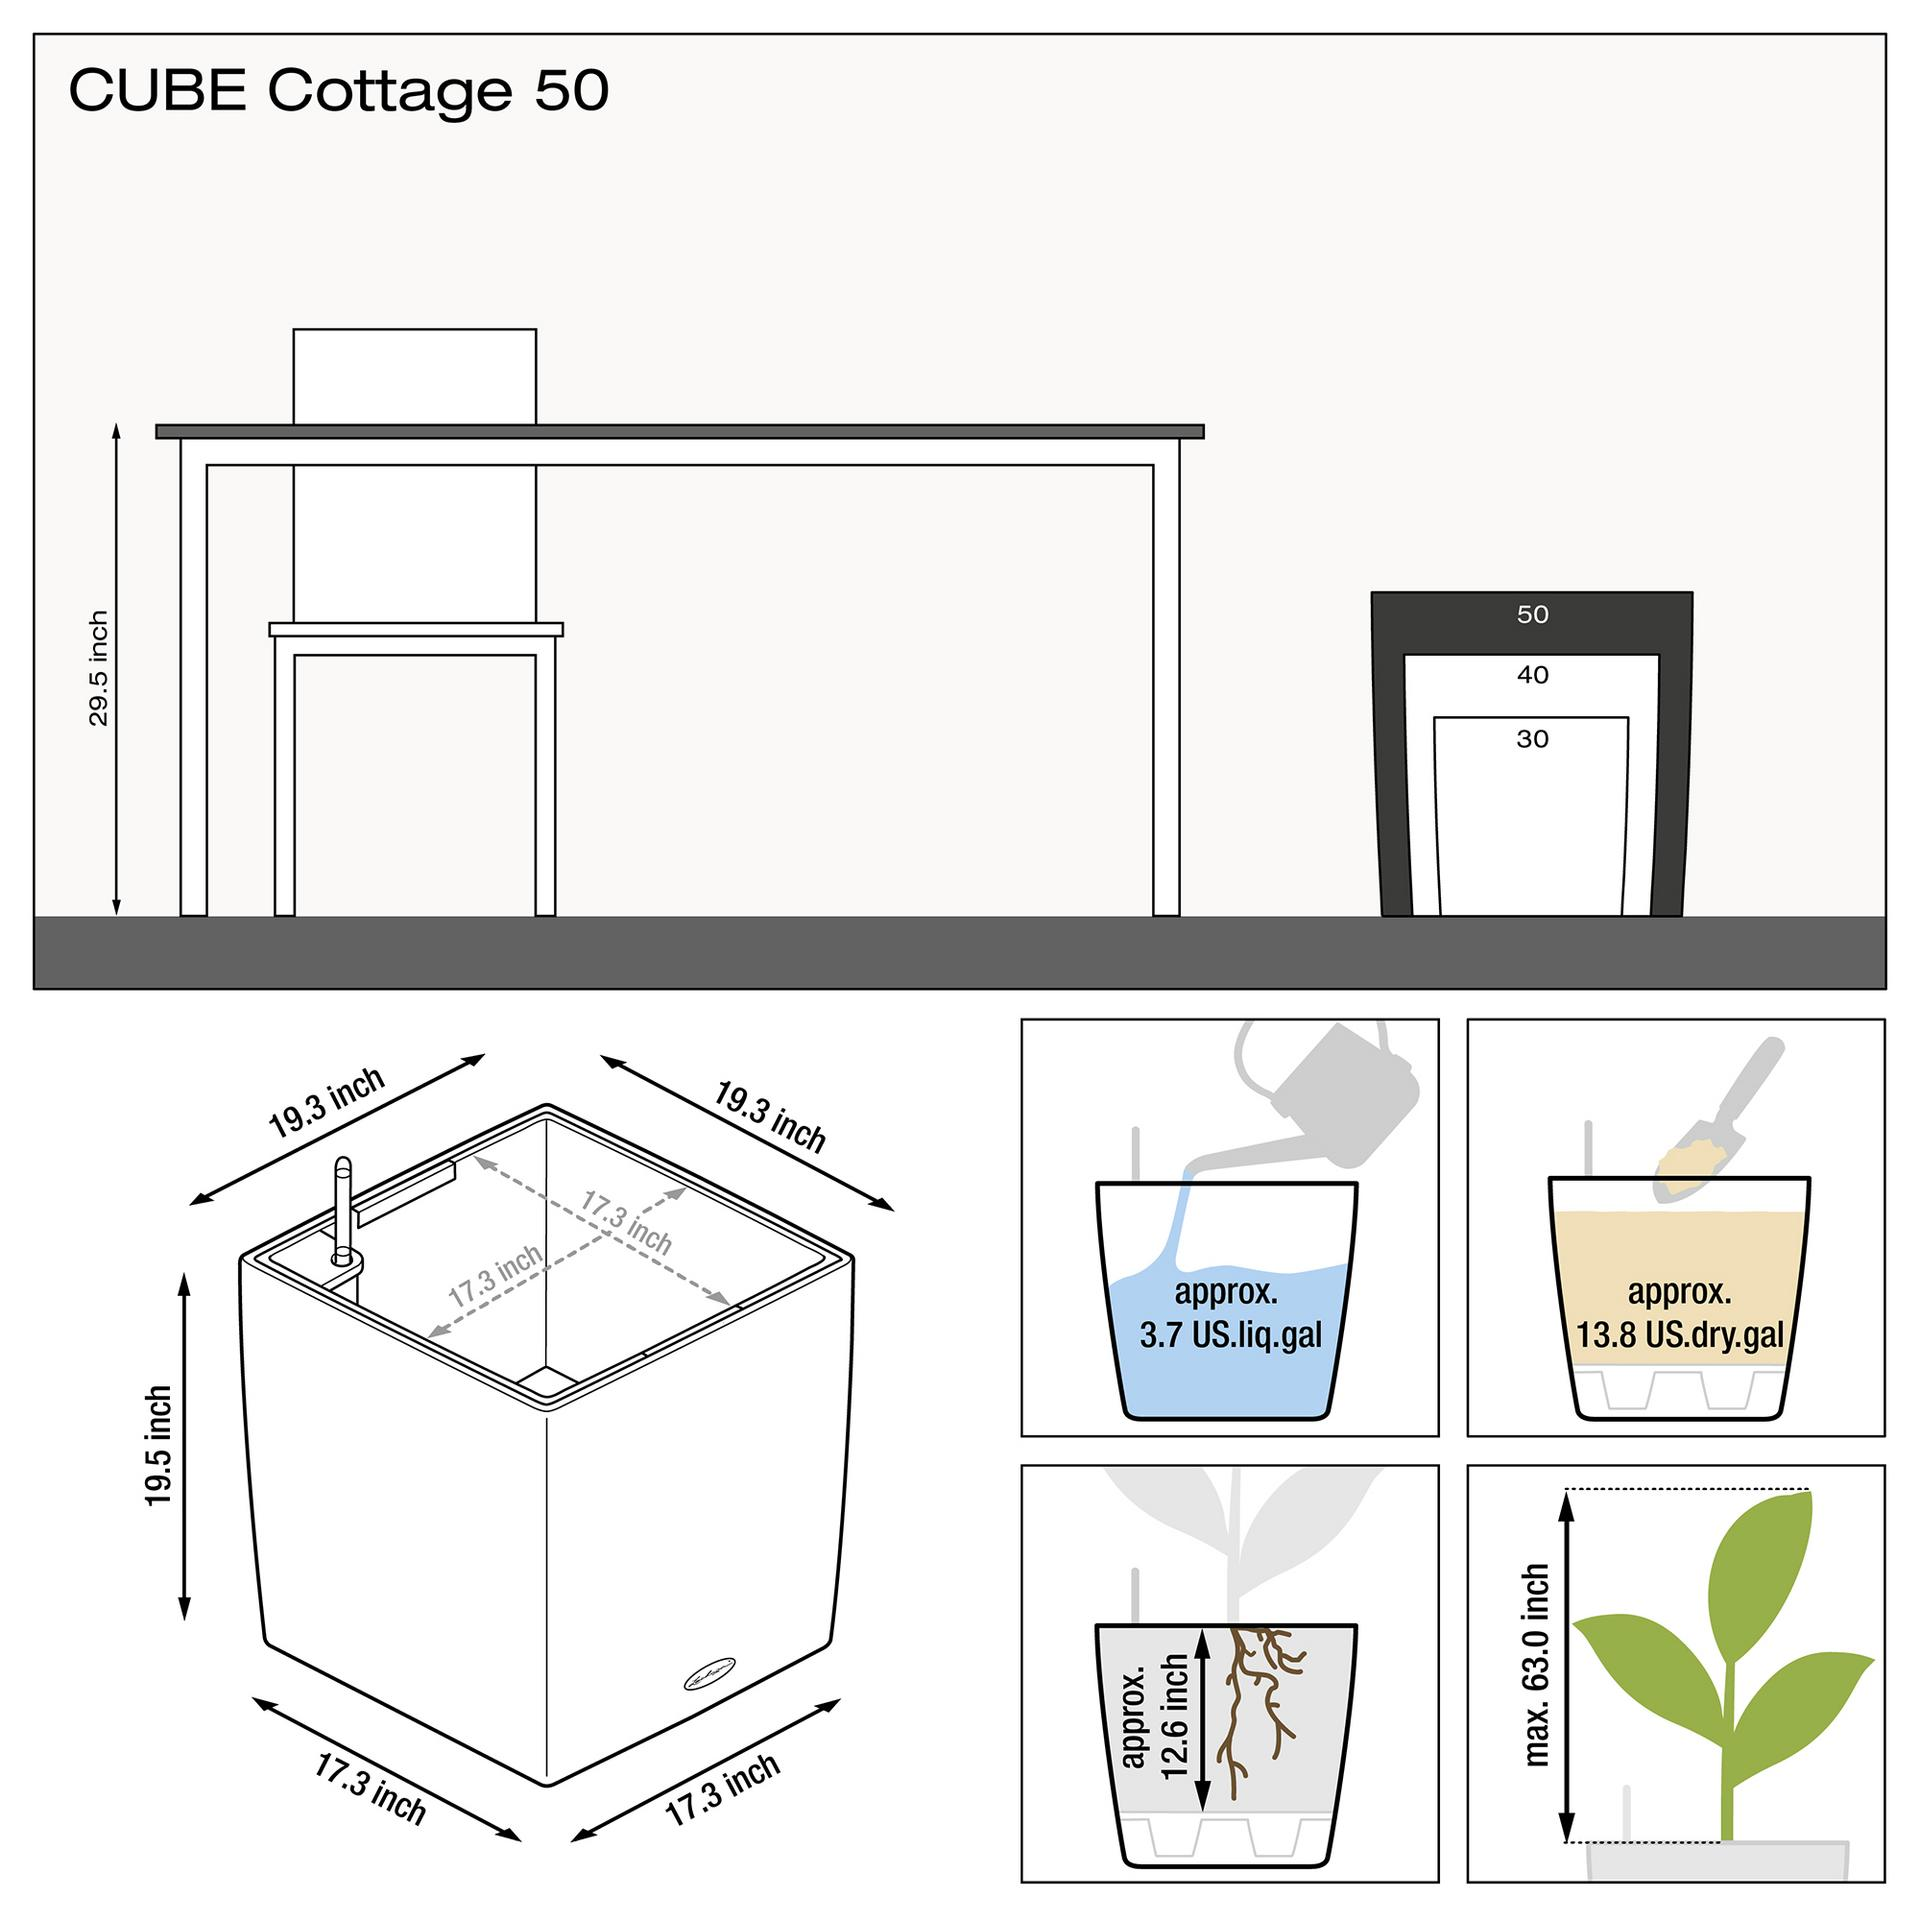 le_cube-cottage50_product_addi_nz_us